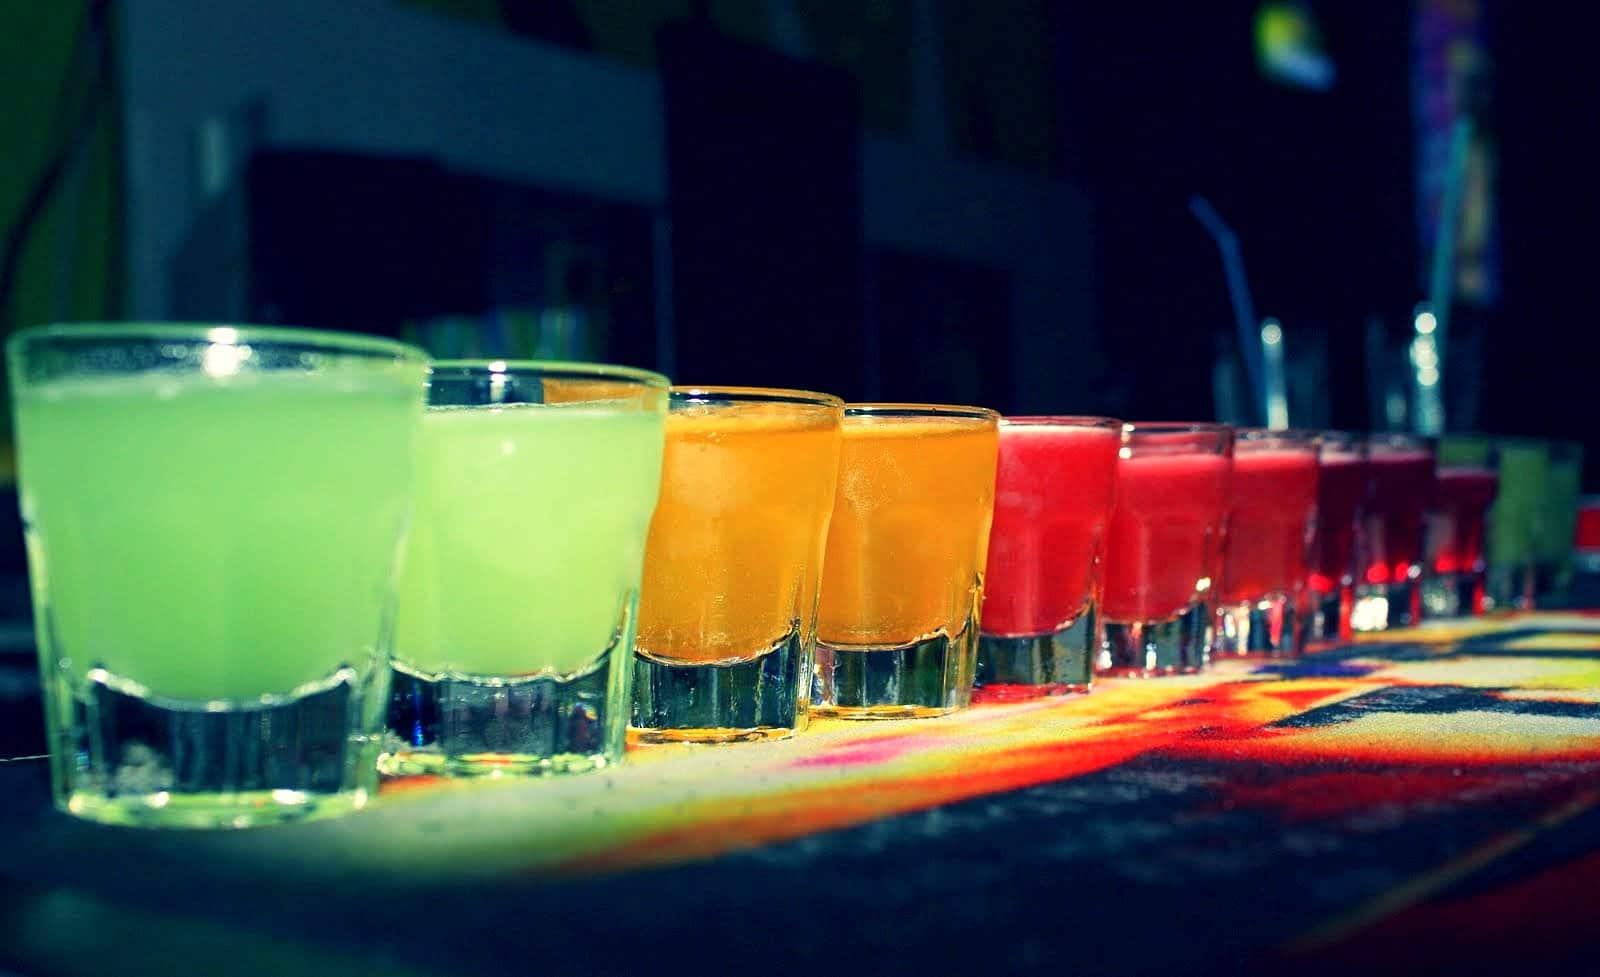 Vodka Tasting Warsaw Xperiencepoland Com Watermelon Wallpaper Rainbow Find Free HD for Desktop [freshlhys.tk]